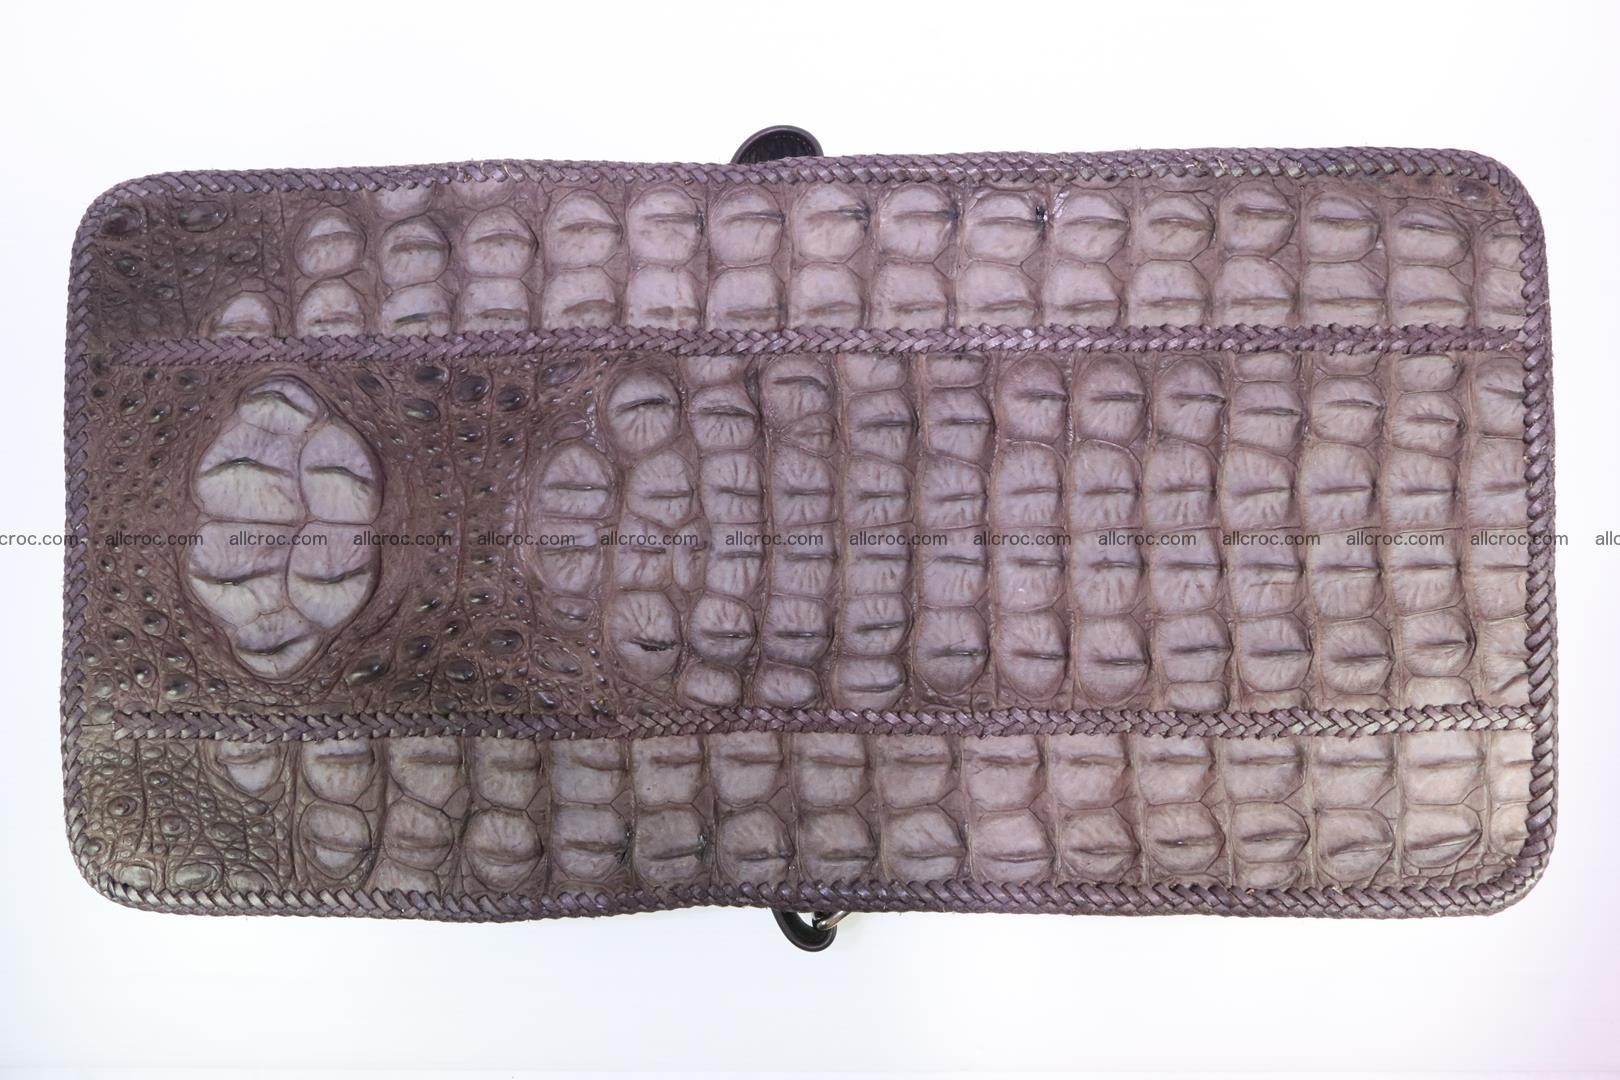 Сrocodile skin shoulder bag with braided edges 142 Foto 12